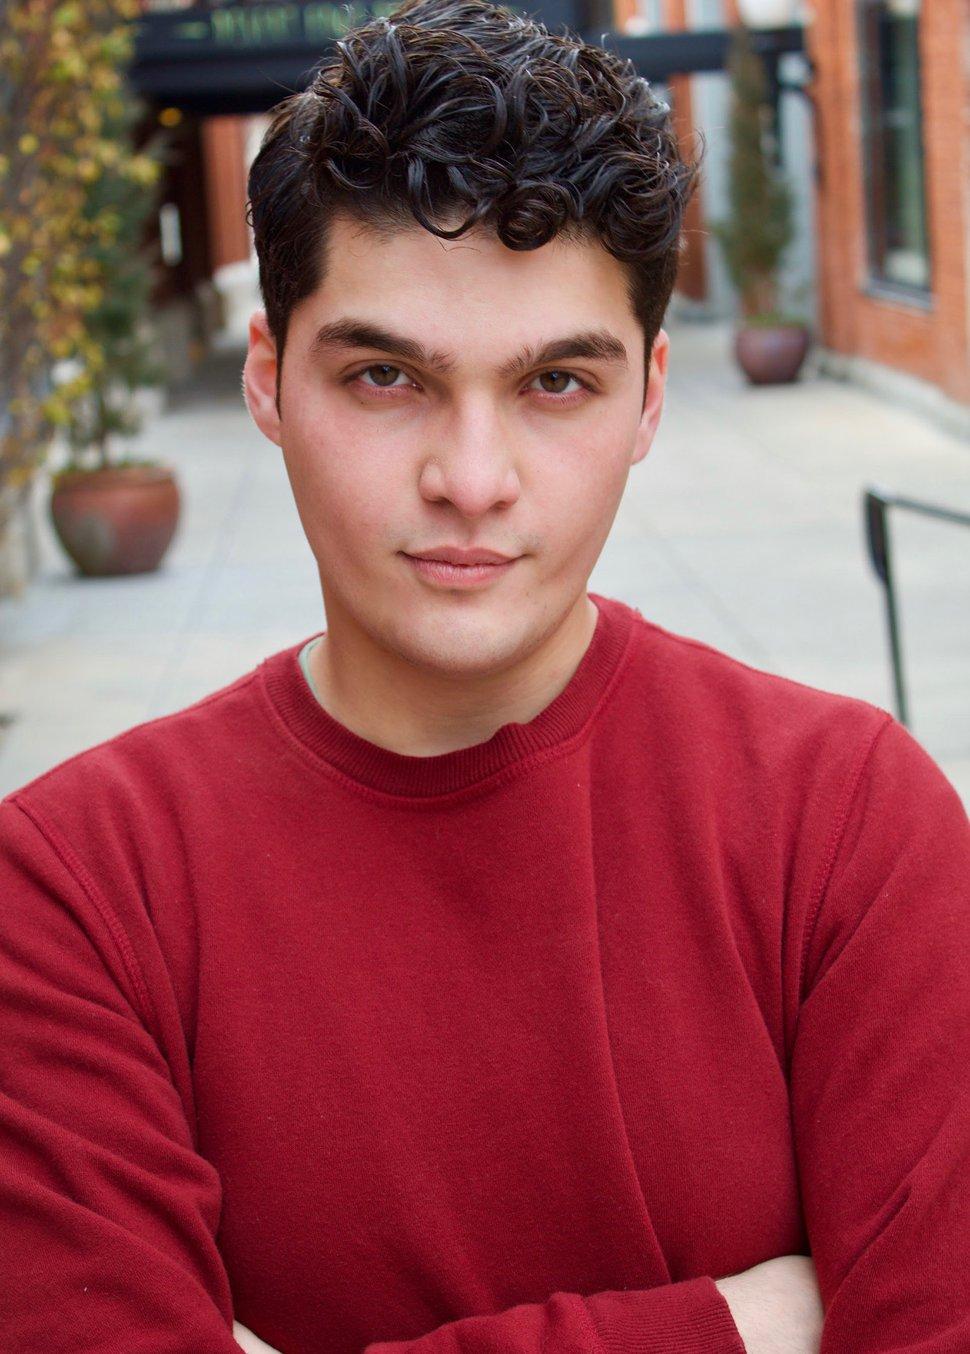 (Photo courtesy of Danny Borba) Danny Borba, 20, in a headshot taken to apply for acting roles. Borba is a rising junior in University of Utah's Actor Training Program.